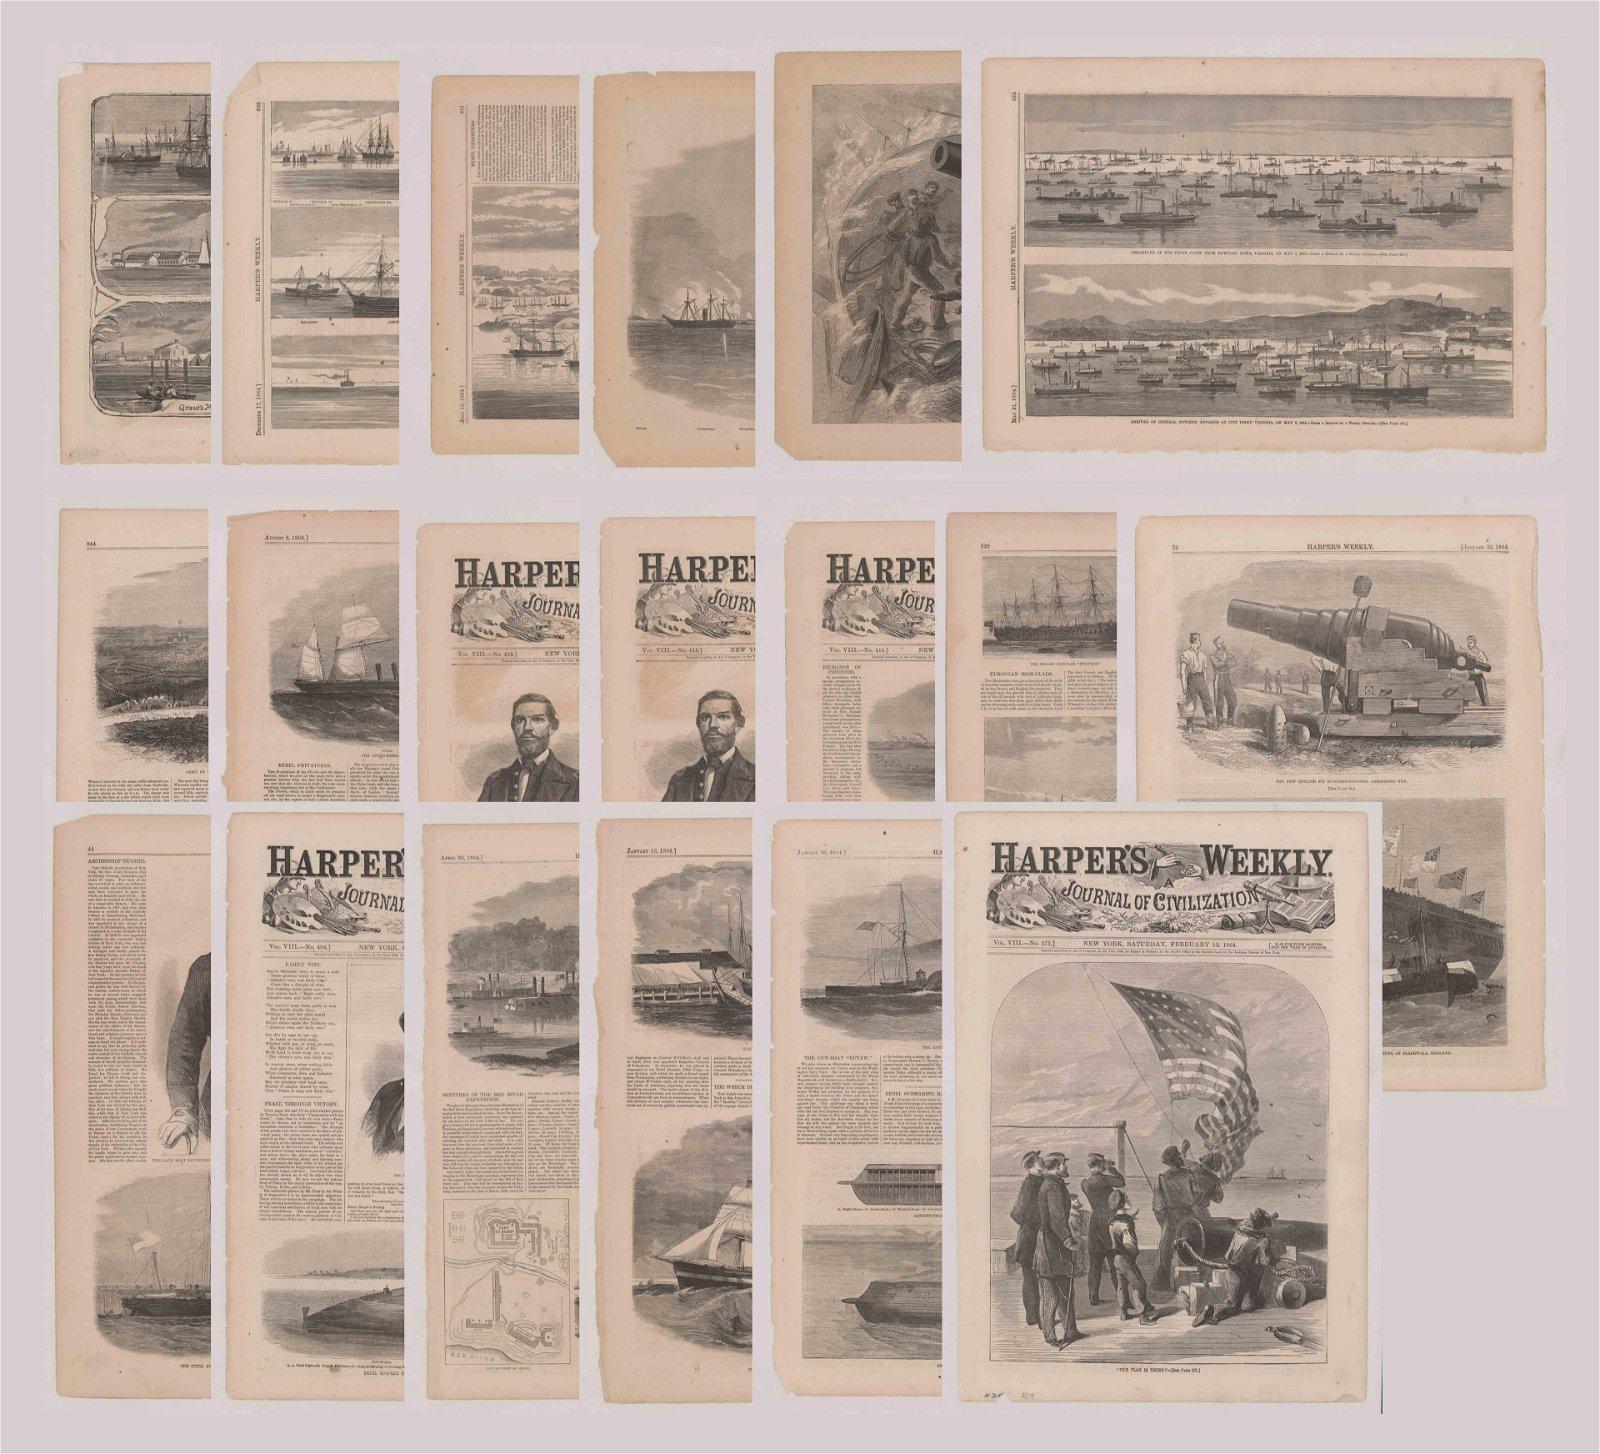 Harper's Weekly Prints [Civil War Naval Ships]